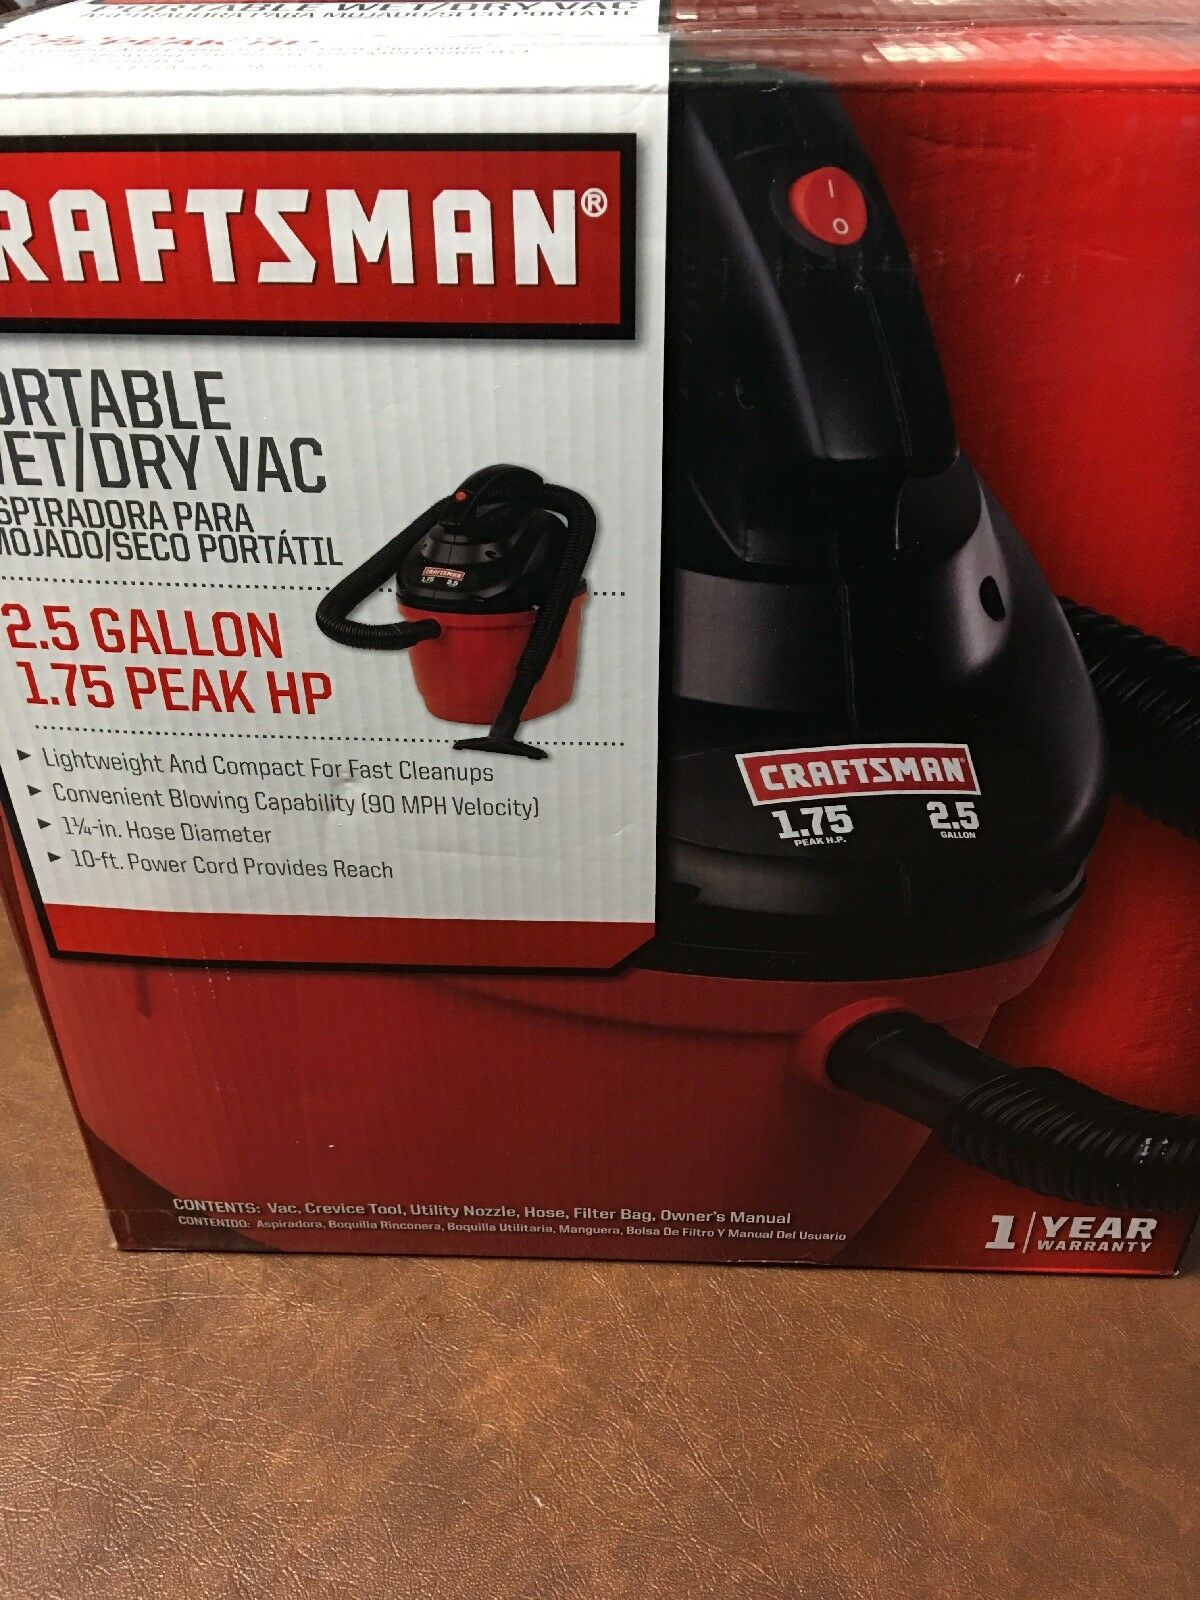 CRAFTSMAN 17611 2.5 Gallon 1.75 Peak HP Wet Dry Vac, Portable Shop Vacuum wit...